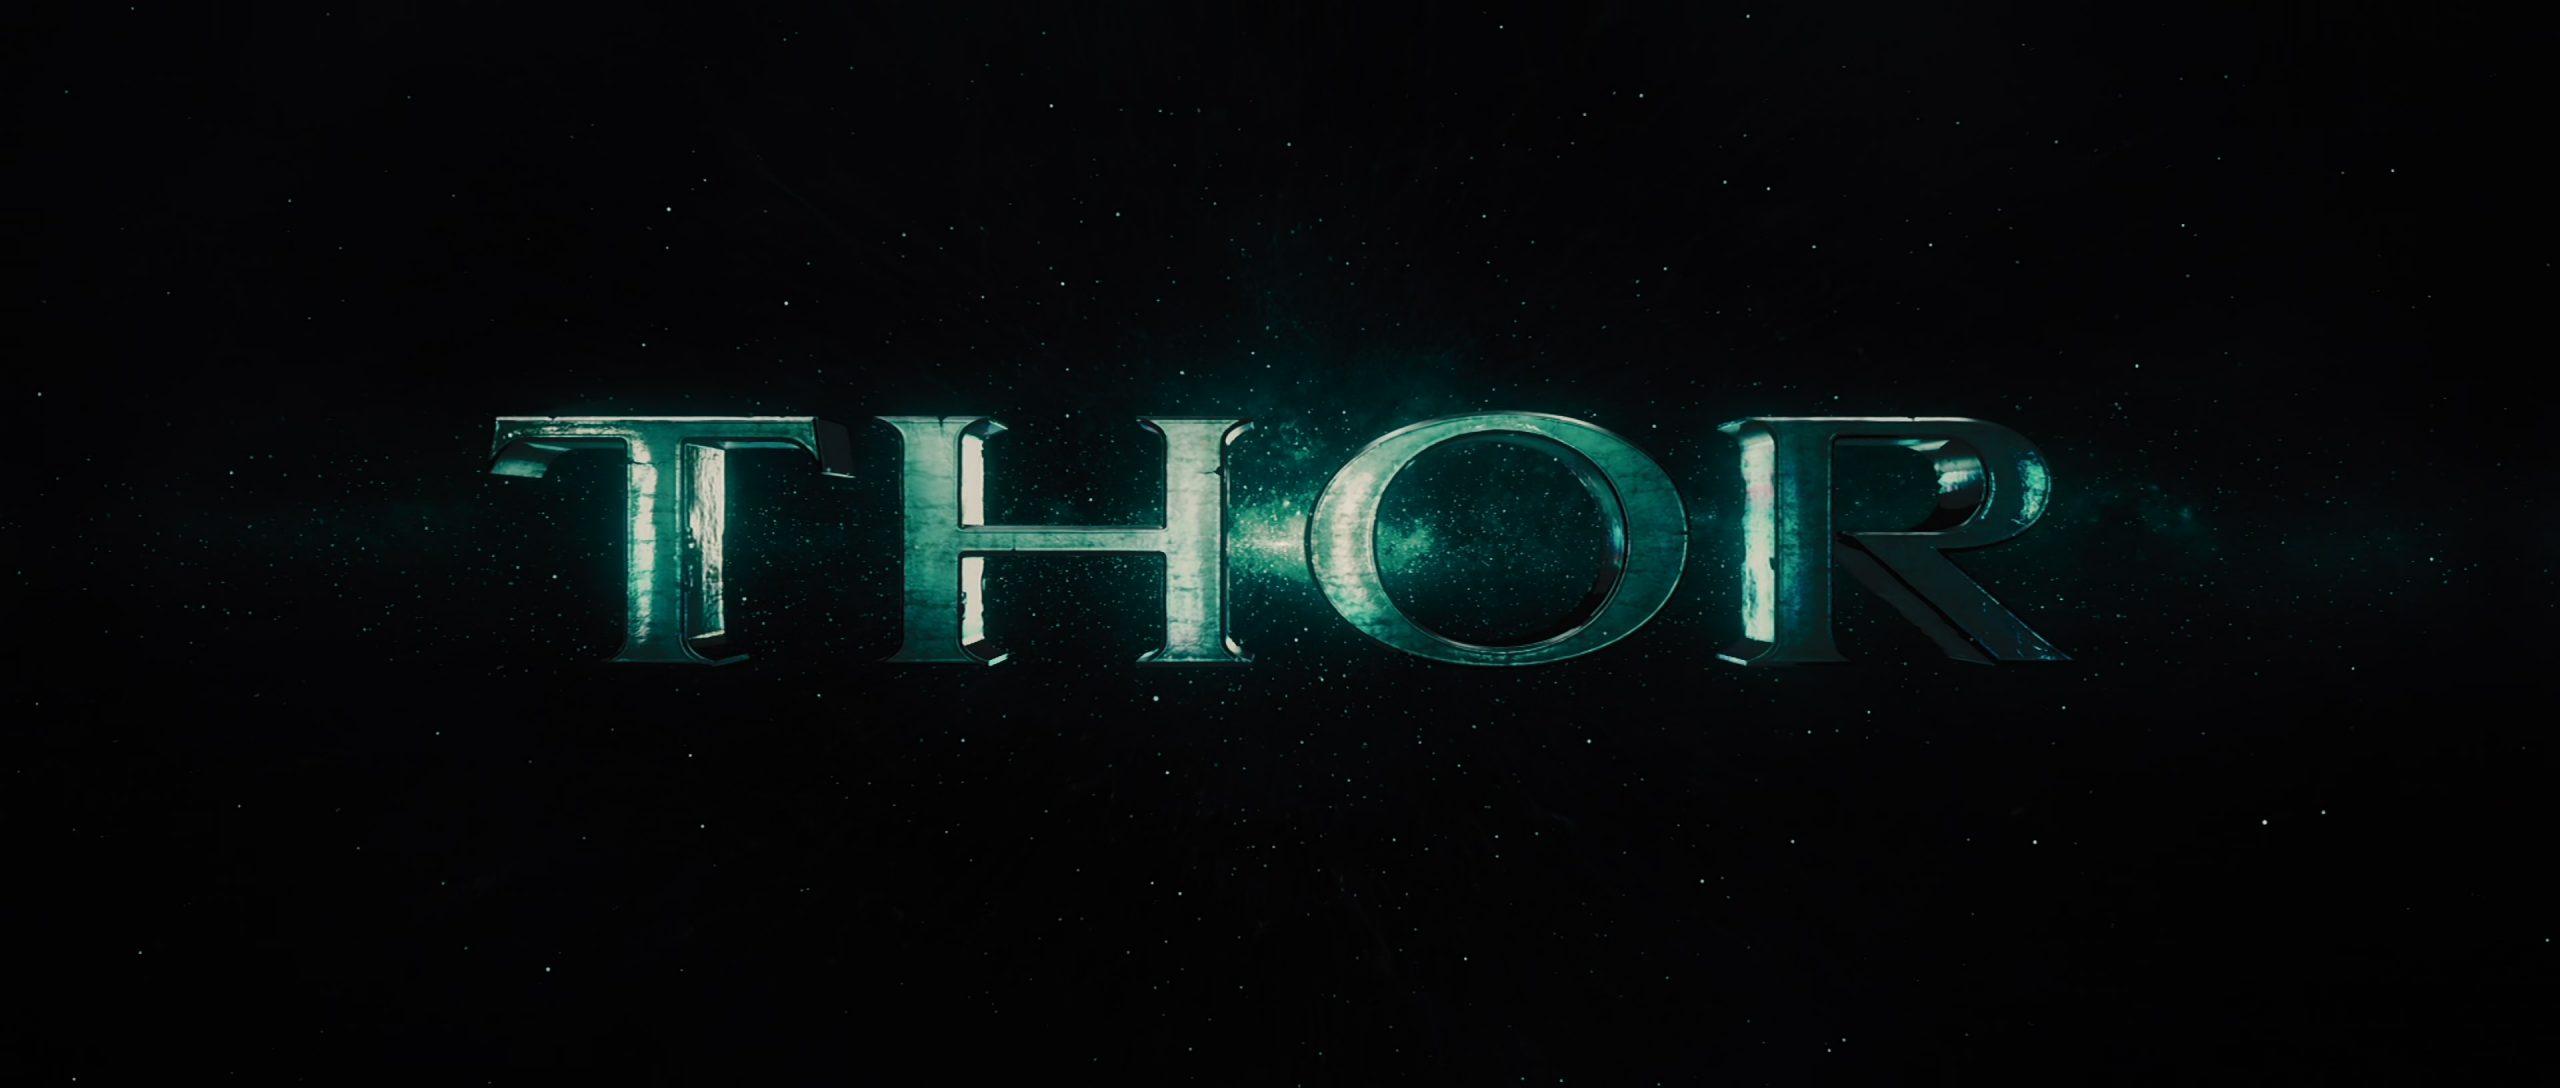 Thor (2011) [4K]